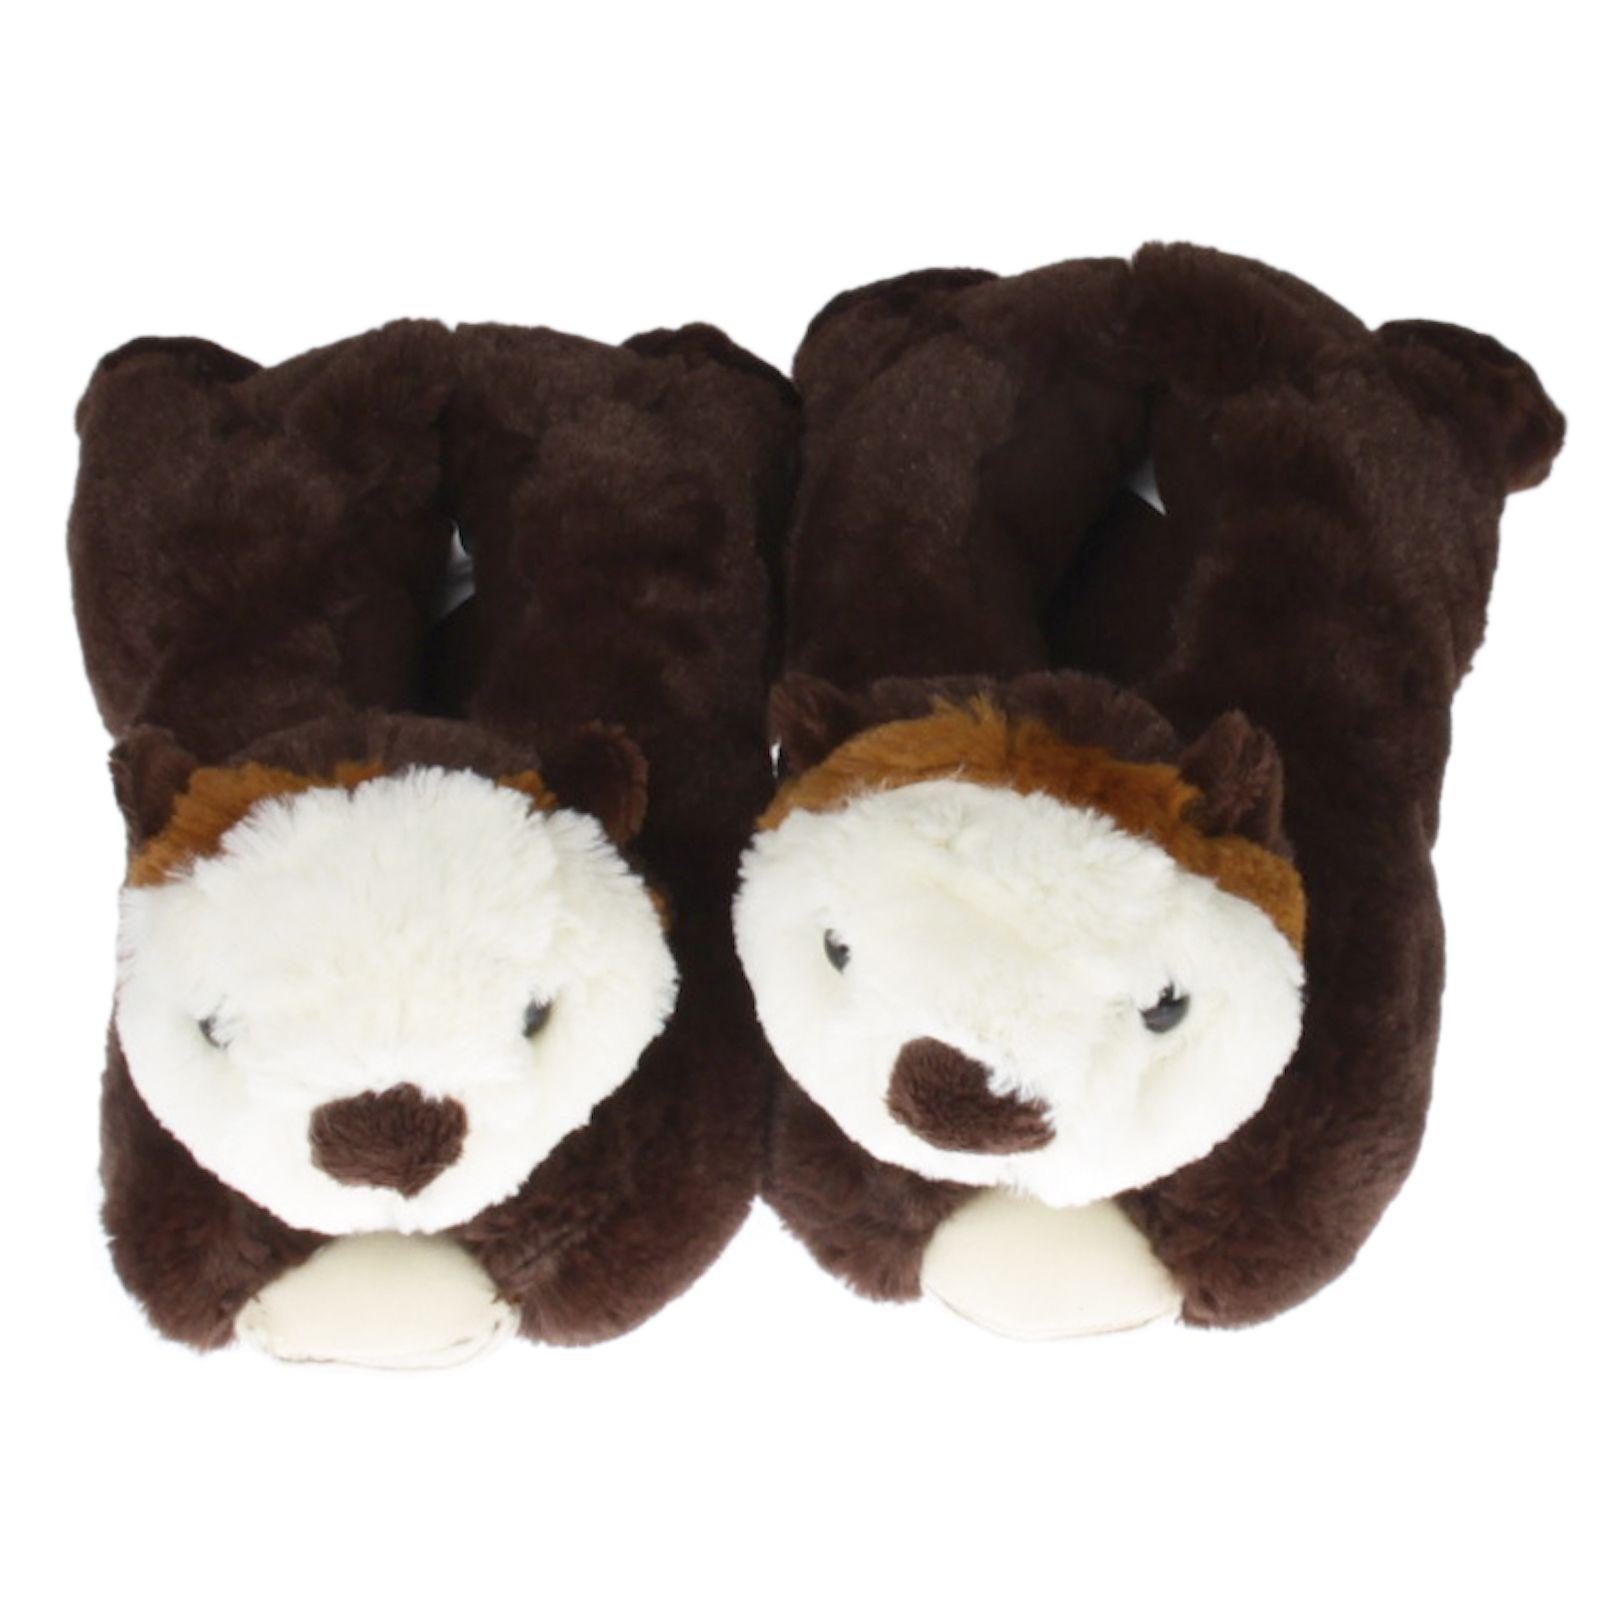 Park Art|My WordPress Blog_Sea Otter Plush Stuffed Animal